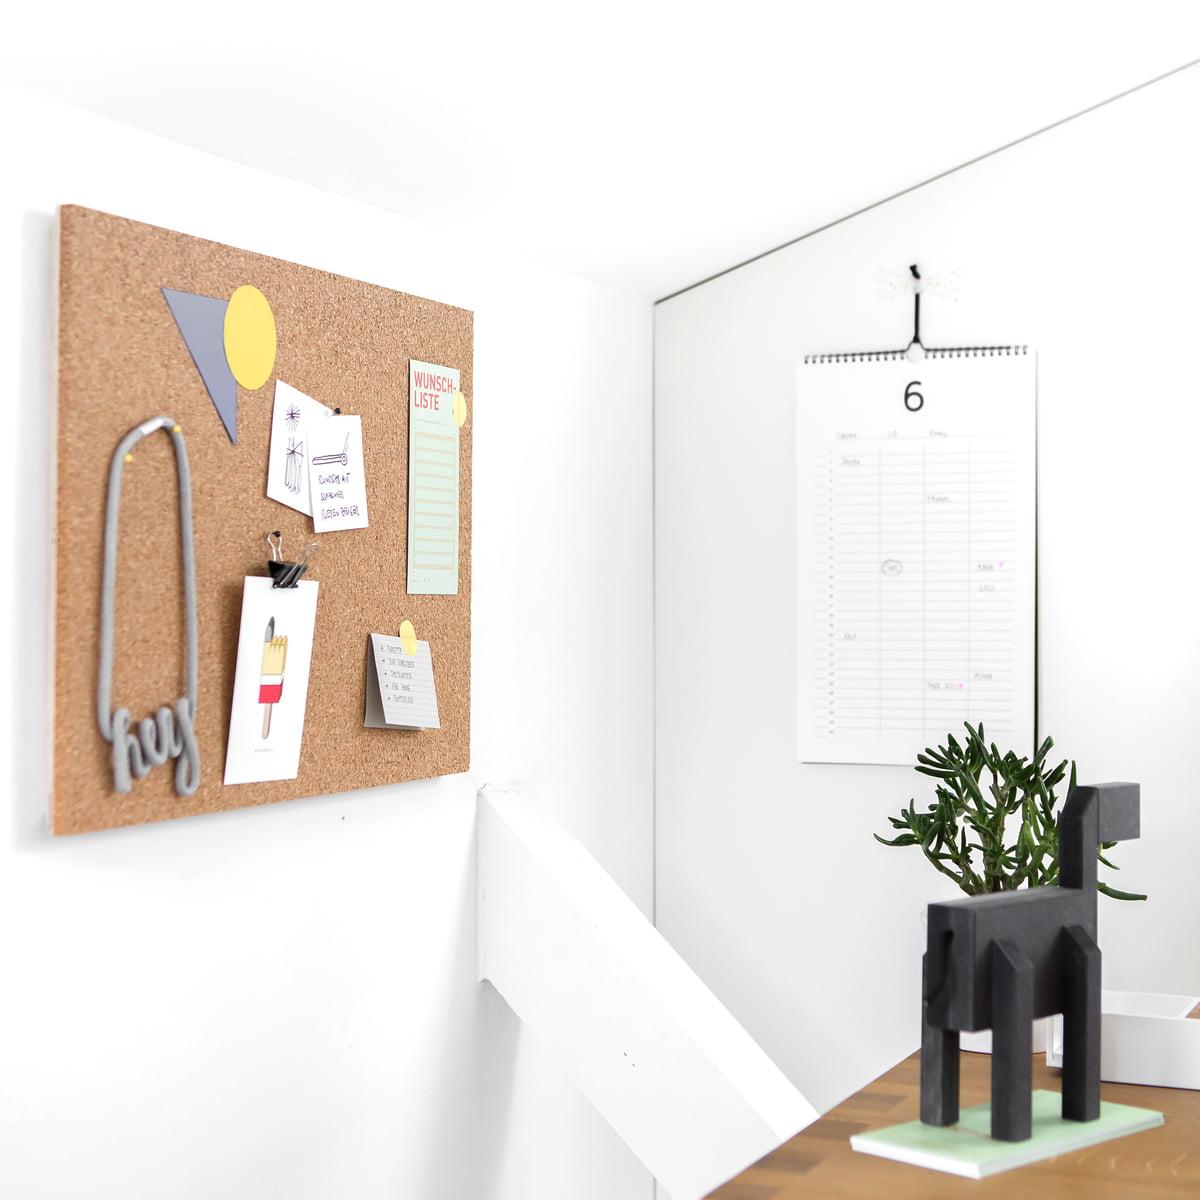 kork fr pinnwand perfect kork pinnwand fuado with kork fr pinnwand pinnwand gestalten best. Black Bedroom Furniture Sets. Home Design Ideas